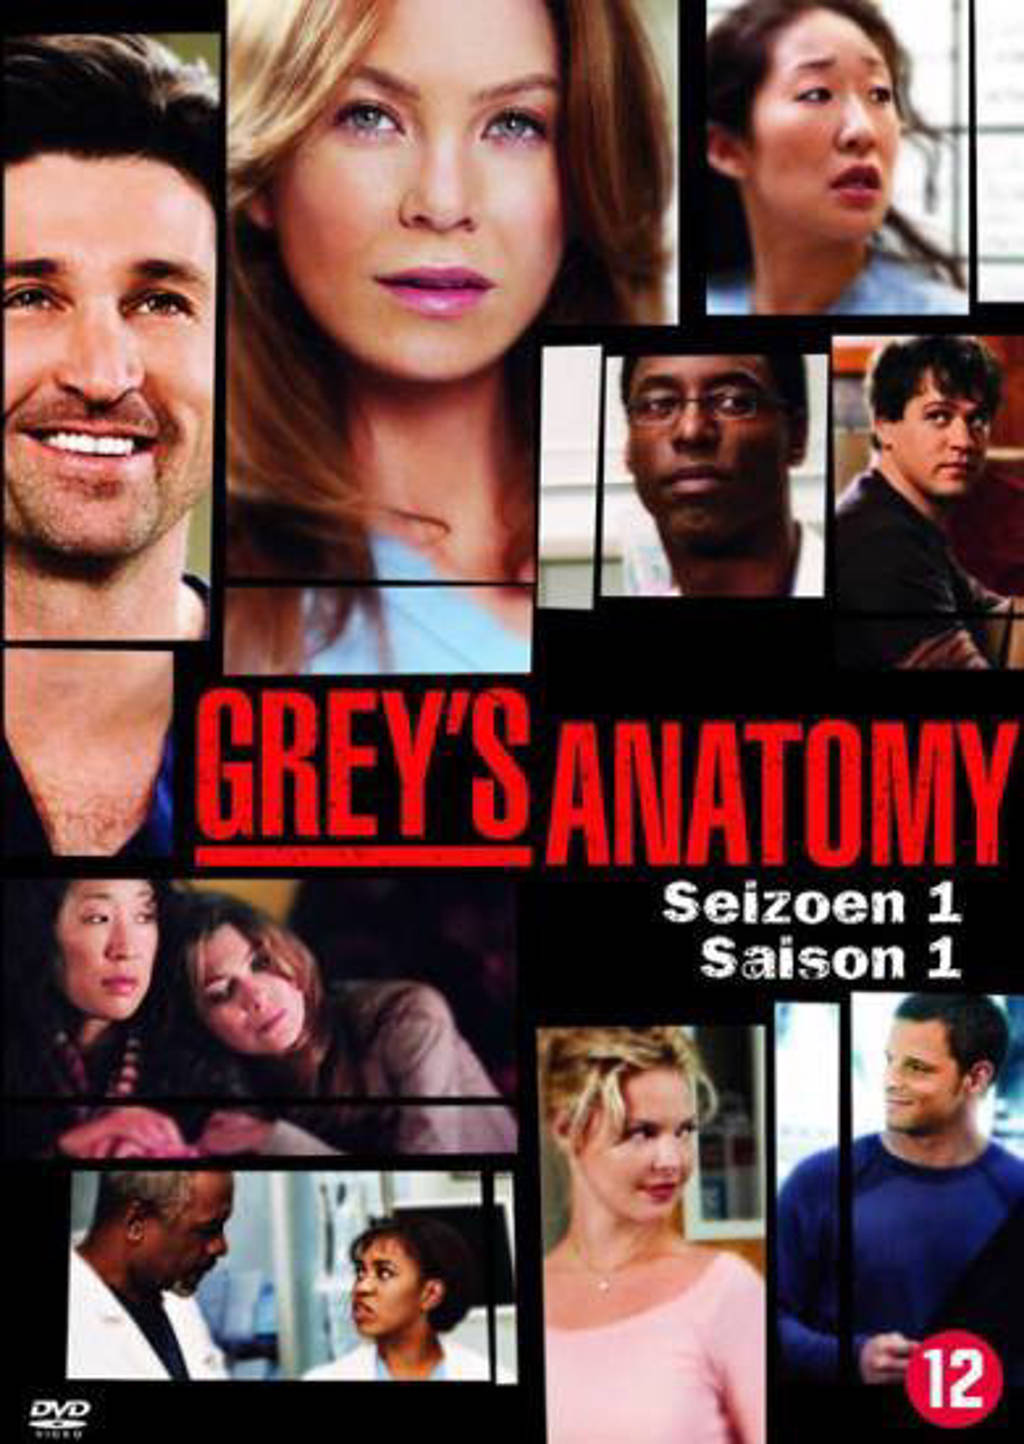 Grey's anatomy - Seizoen 1 (DVD)